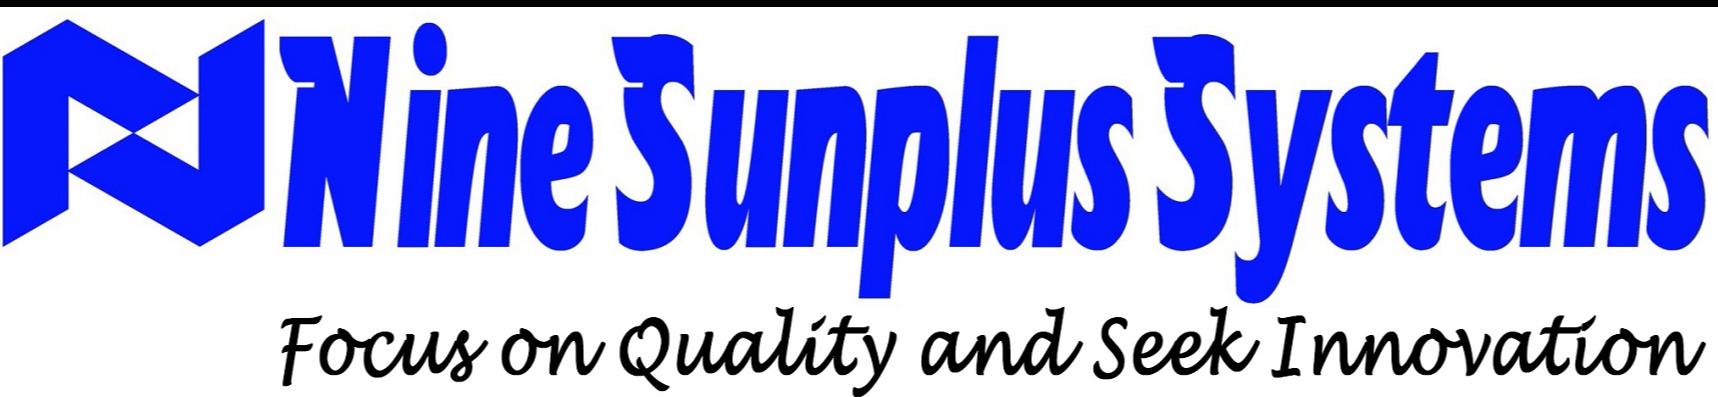 Nine Sunsplus Systems Co., Ltd.